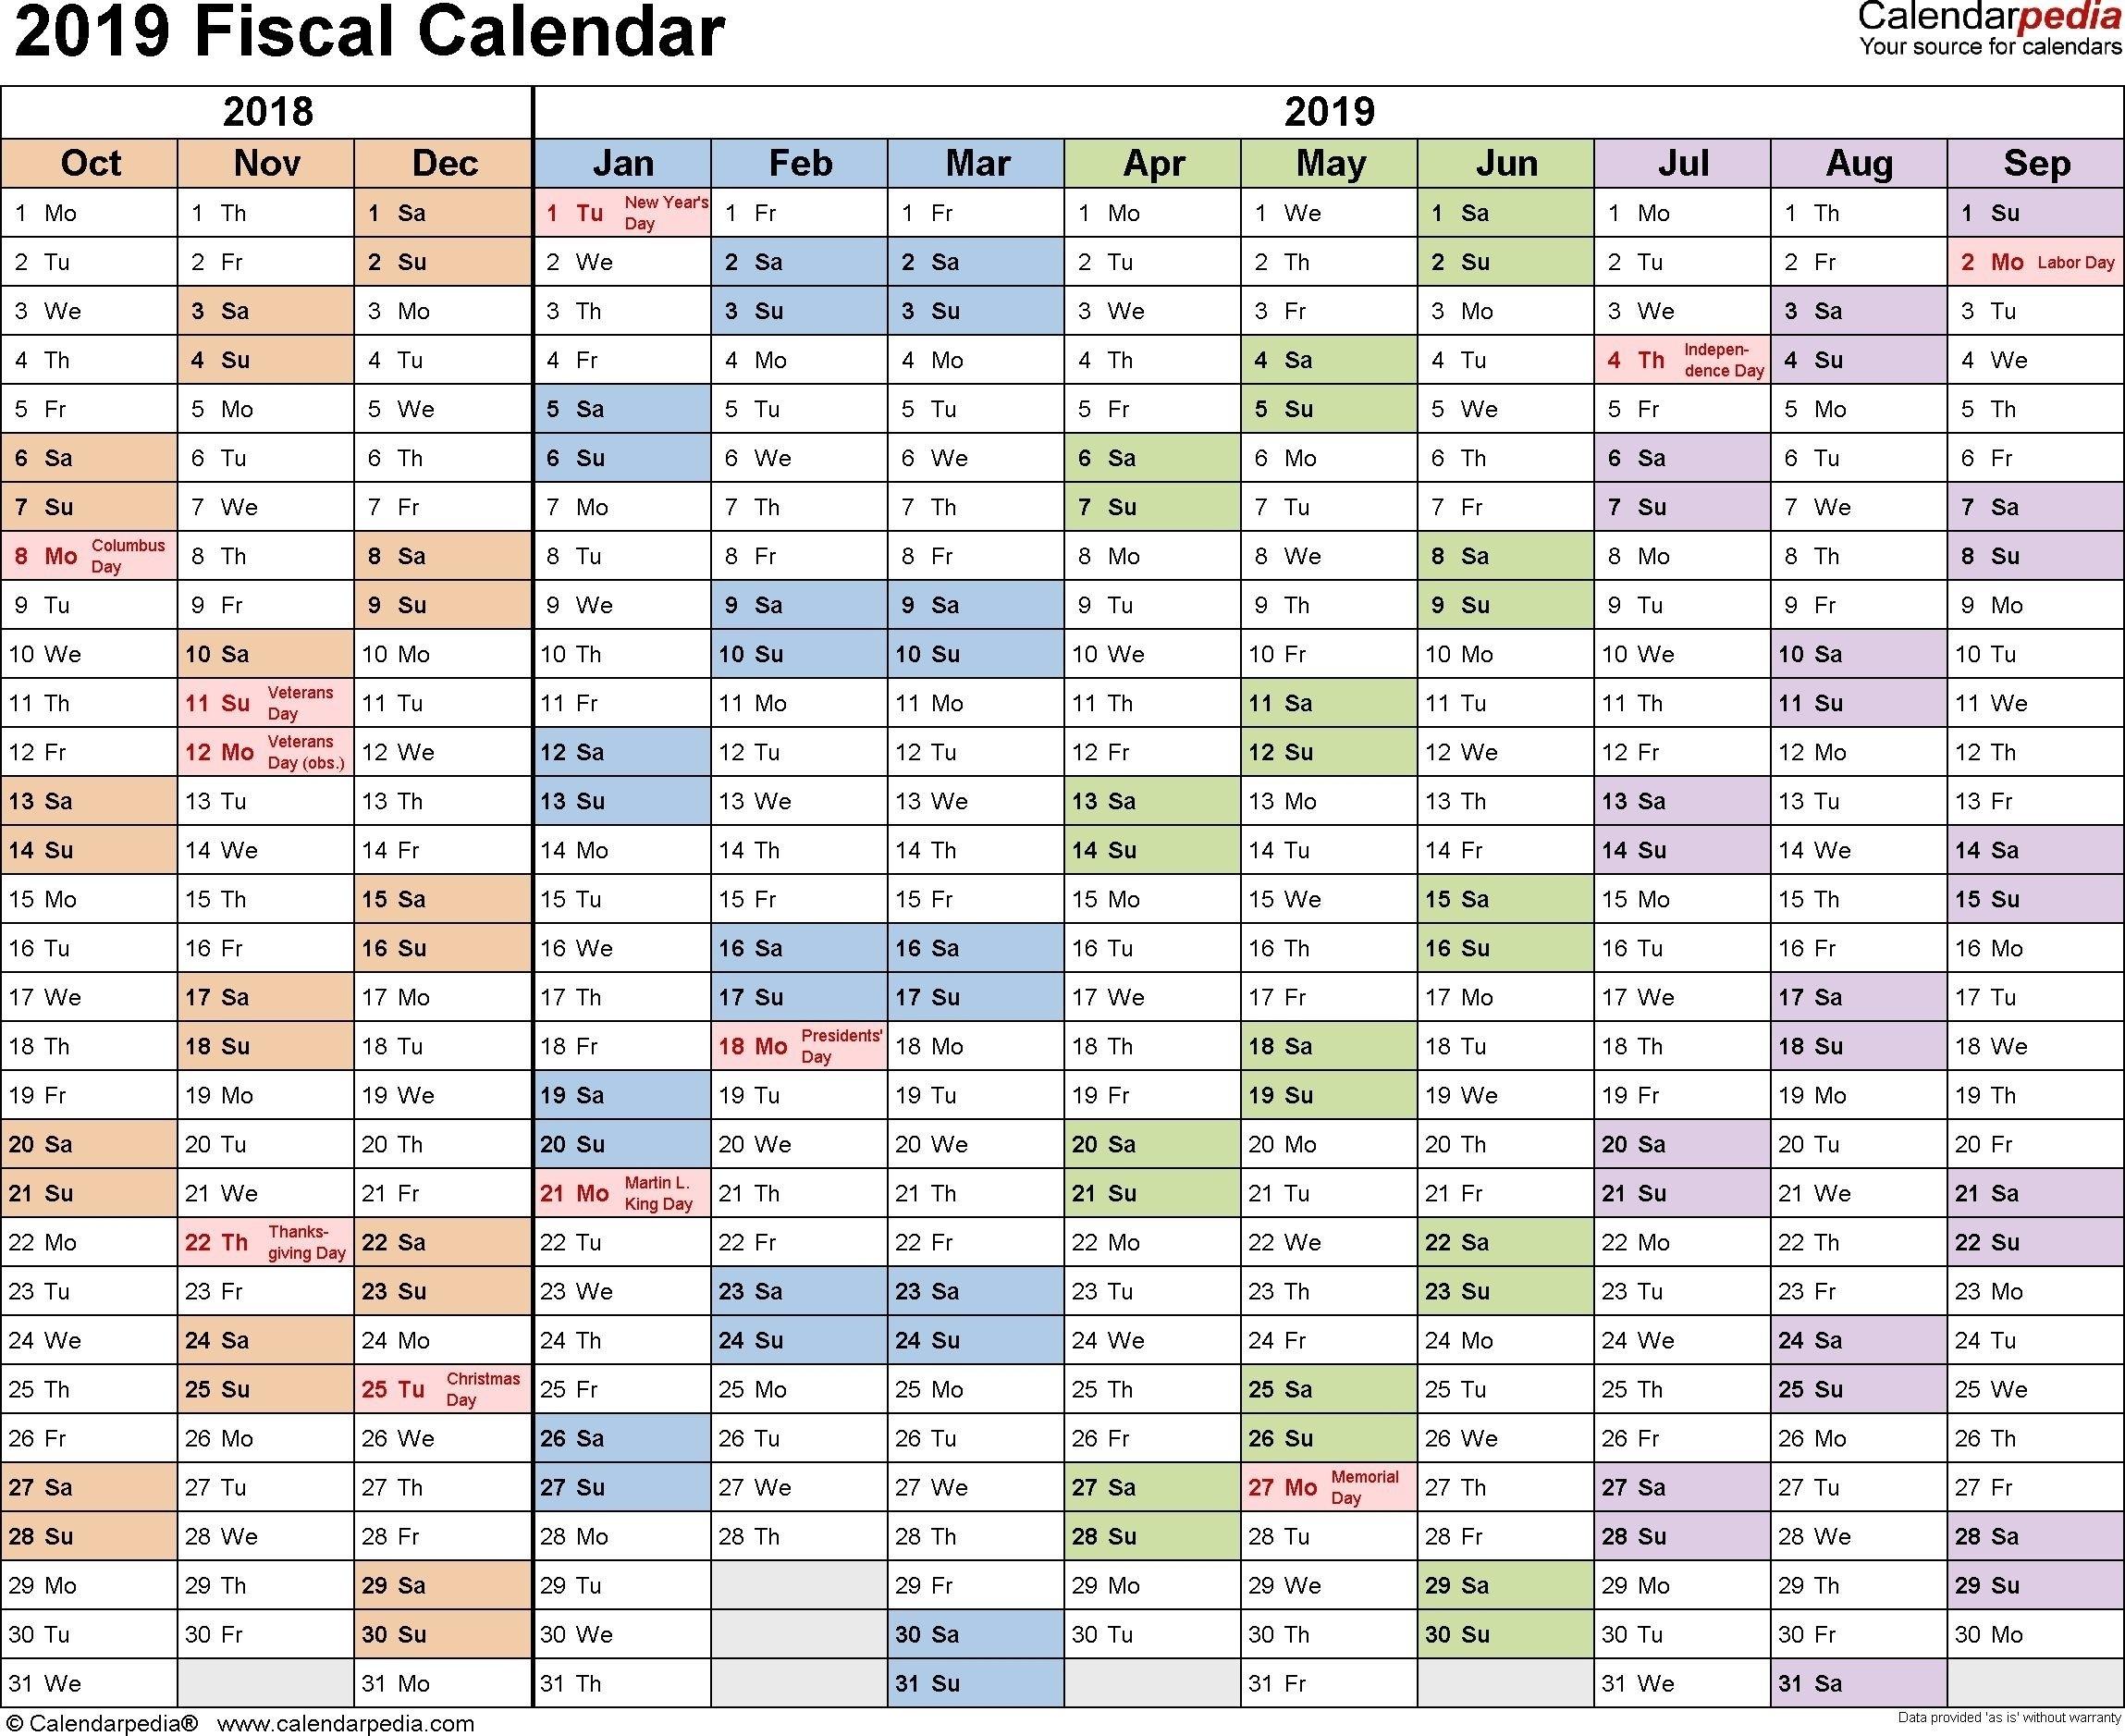 Depo Provera Injection Schedule Calendar 2021 - Template Calendar Design